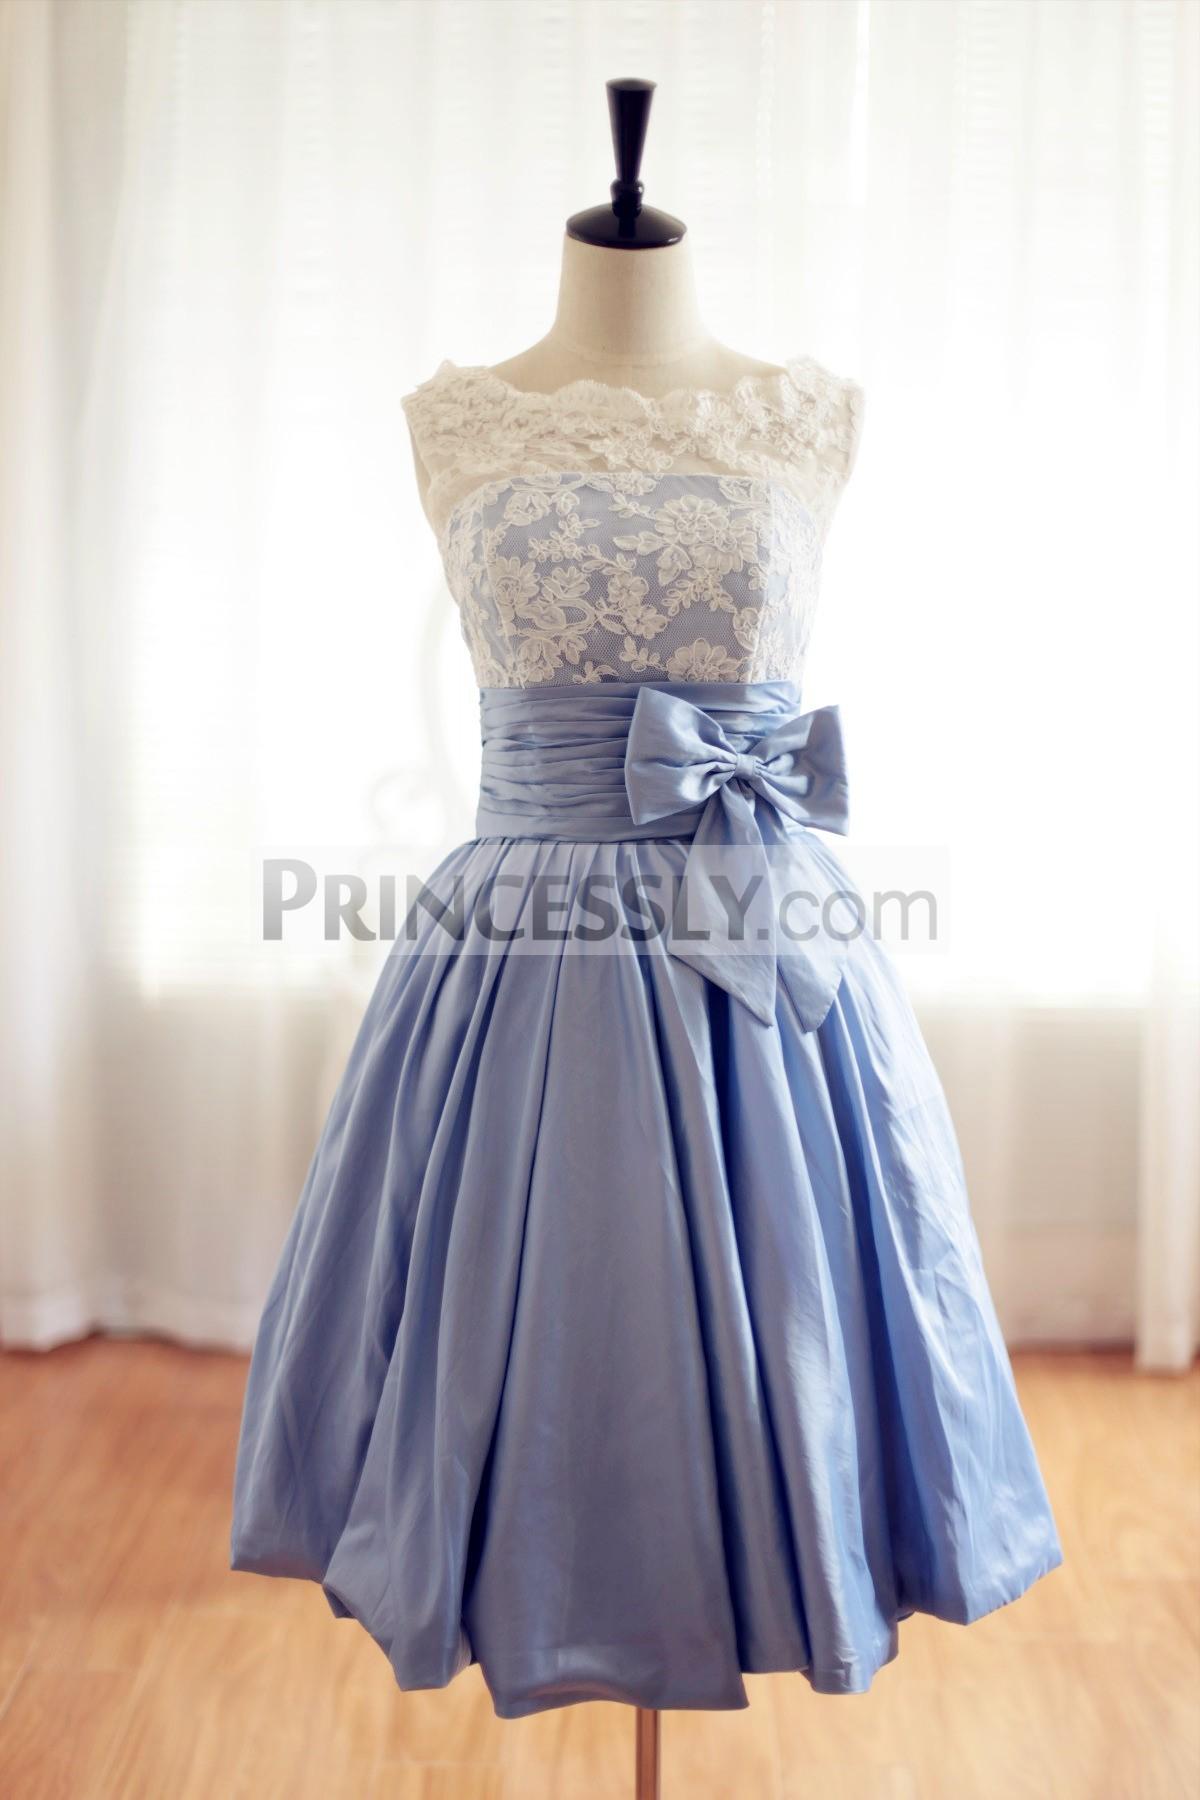 Princessly.com-K1001956-Lace Blue Taffeta Wedding Dress/Bridesmaid Dress in Knee Short Length-31